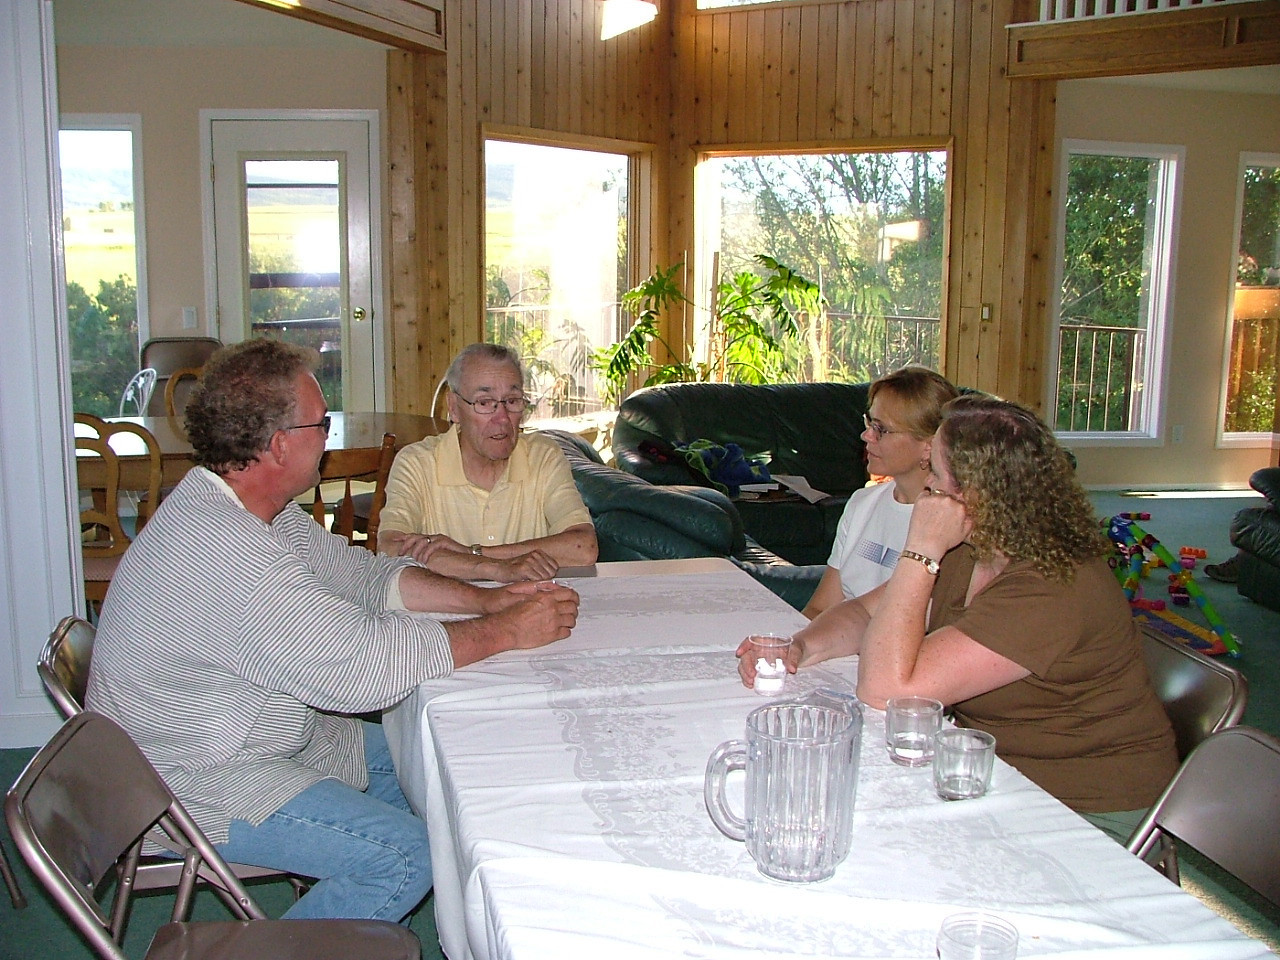 Bill, Grandpa, Karen, Daphne